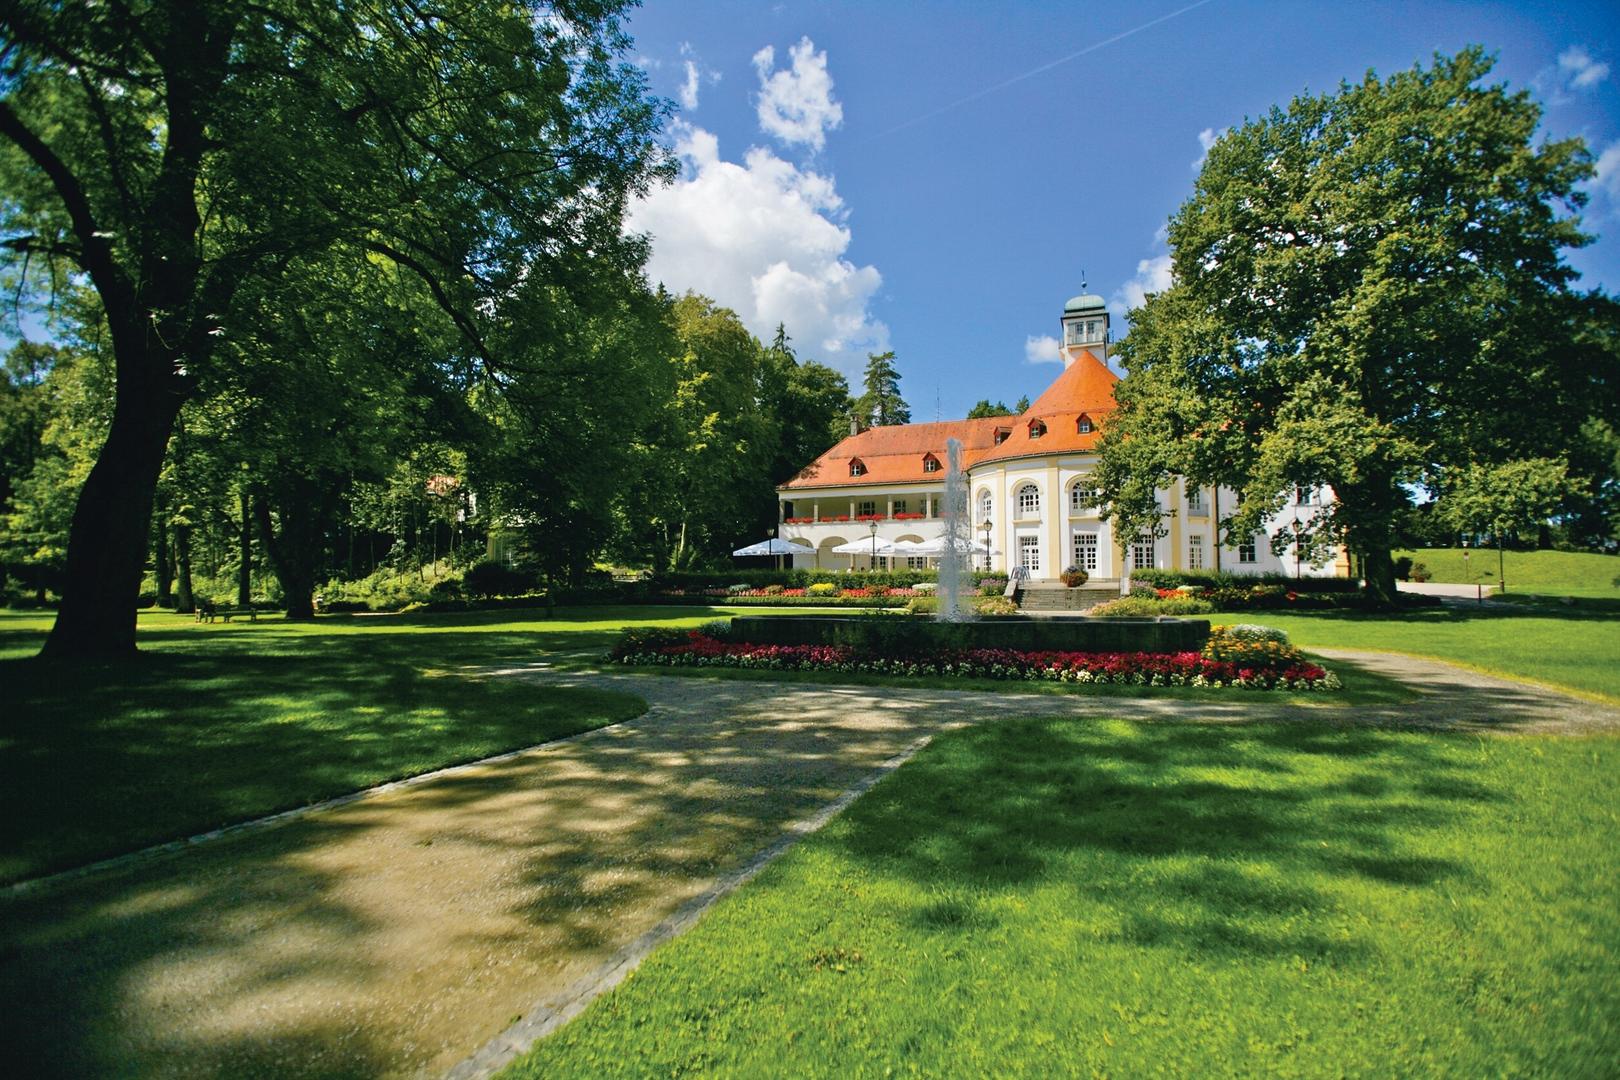 Kurhaus Bad Tölz